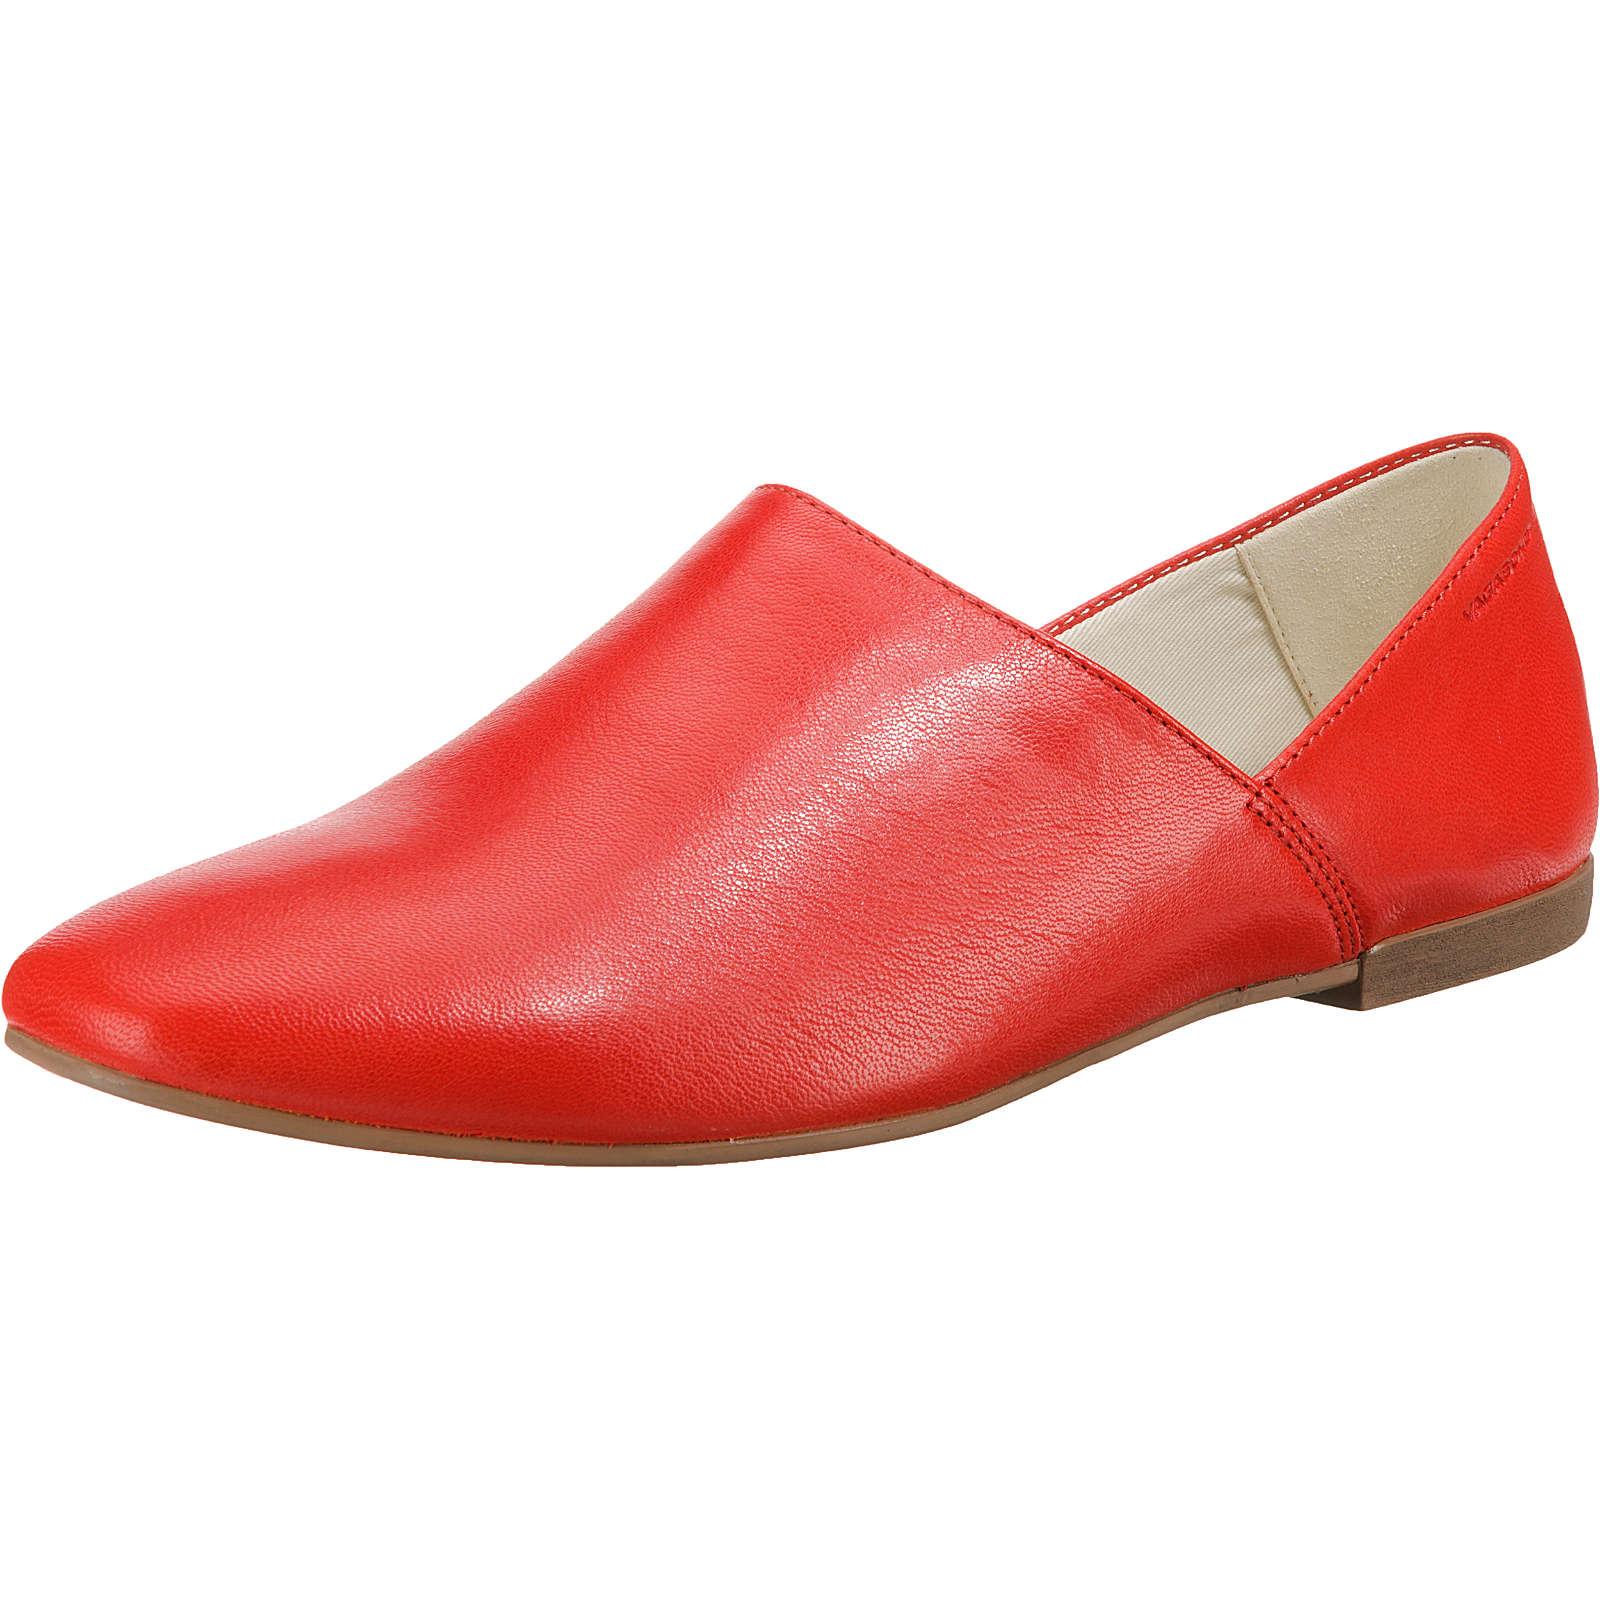 VAGABOND Ayden Klassische Slipper rot Damen Gr. 37